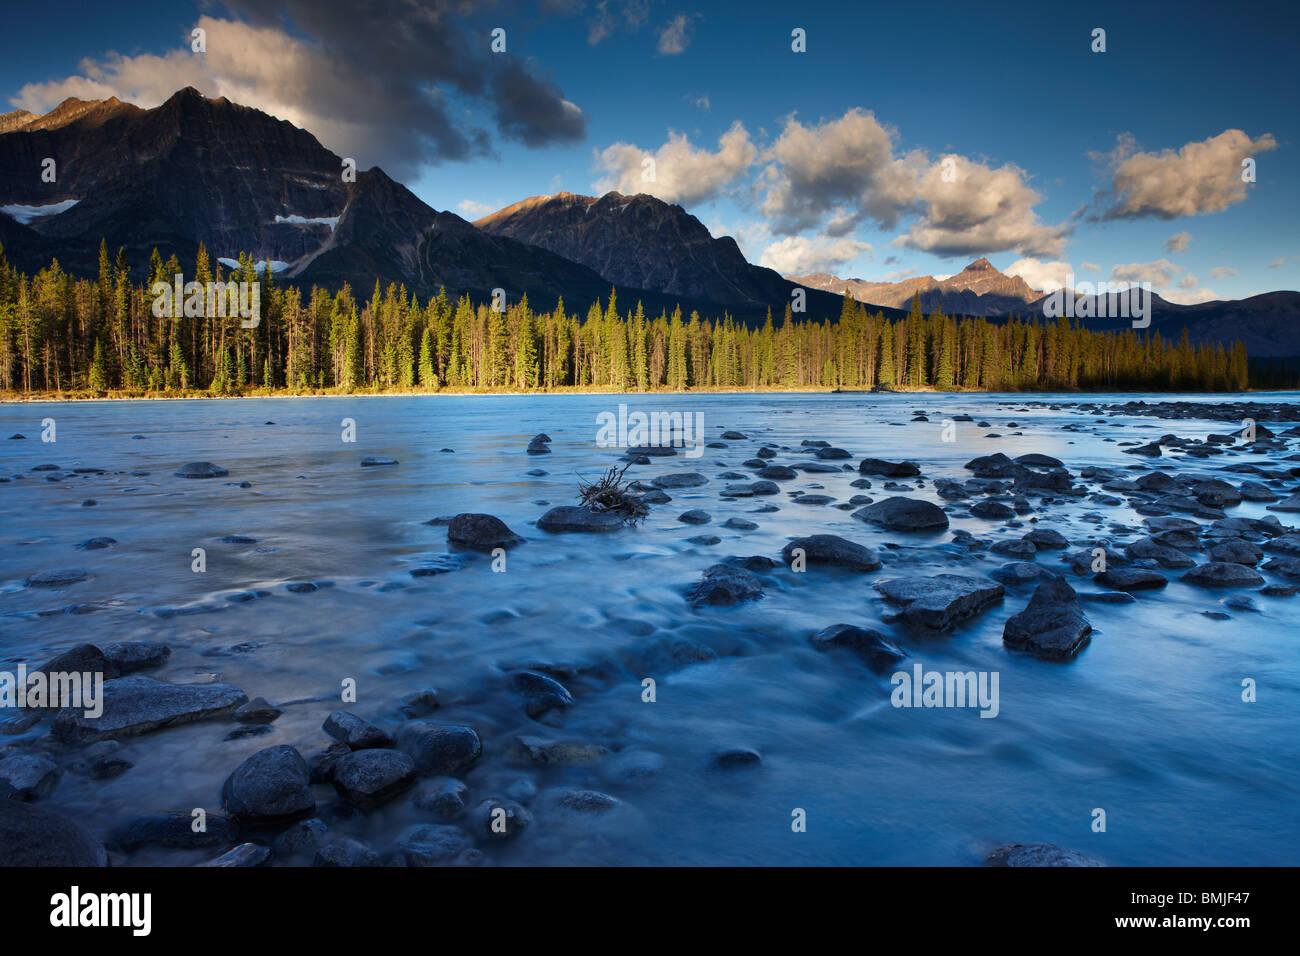 Il Fiume Athabasca con Mt Fryatt & Mt Edith Cavell, Jasper National Park, Alberta, Canada Immagini Stock